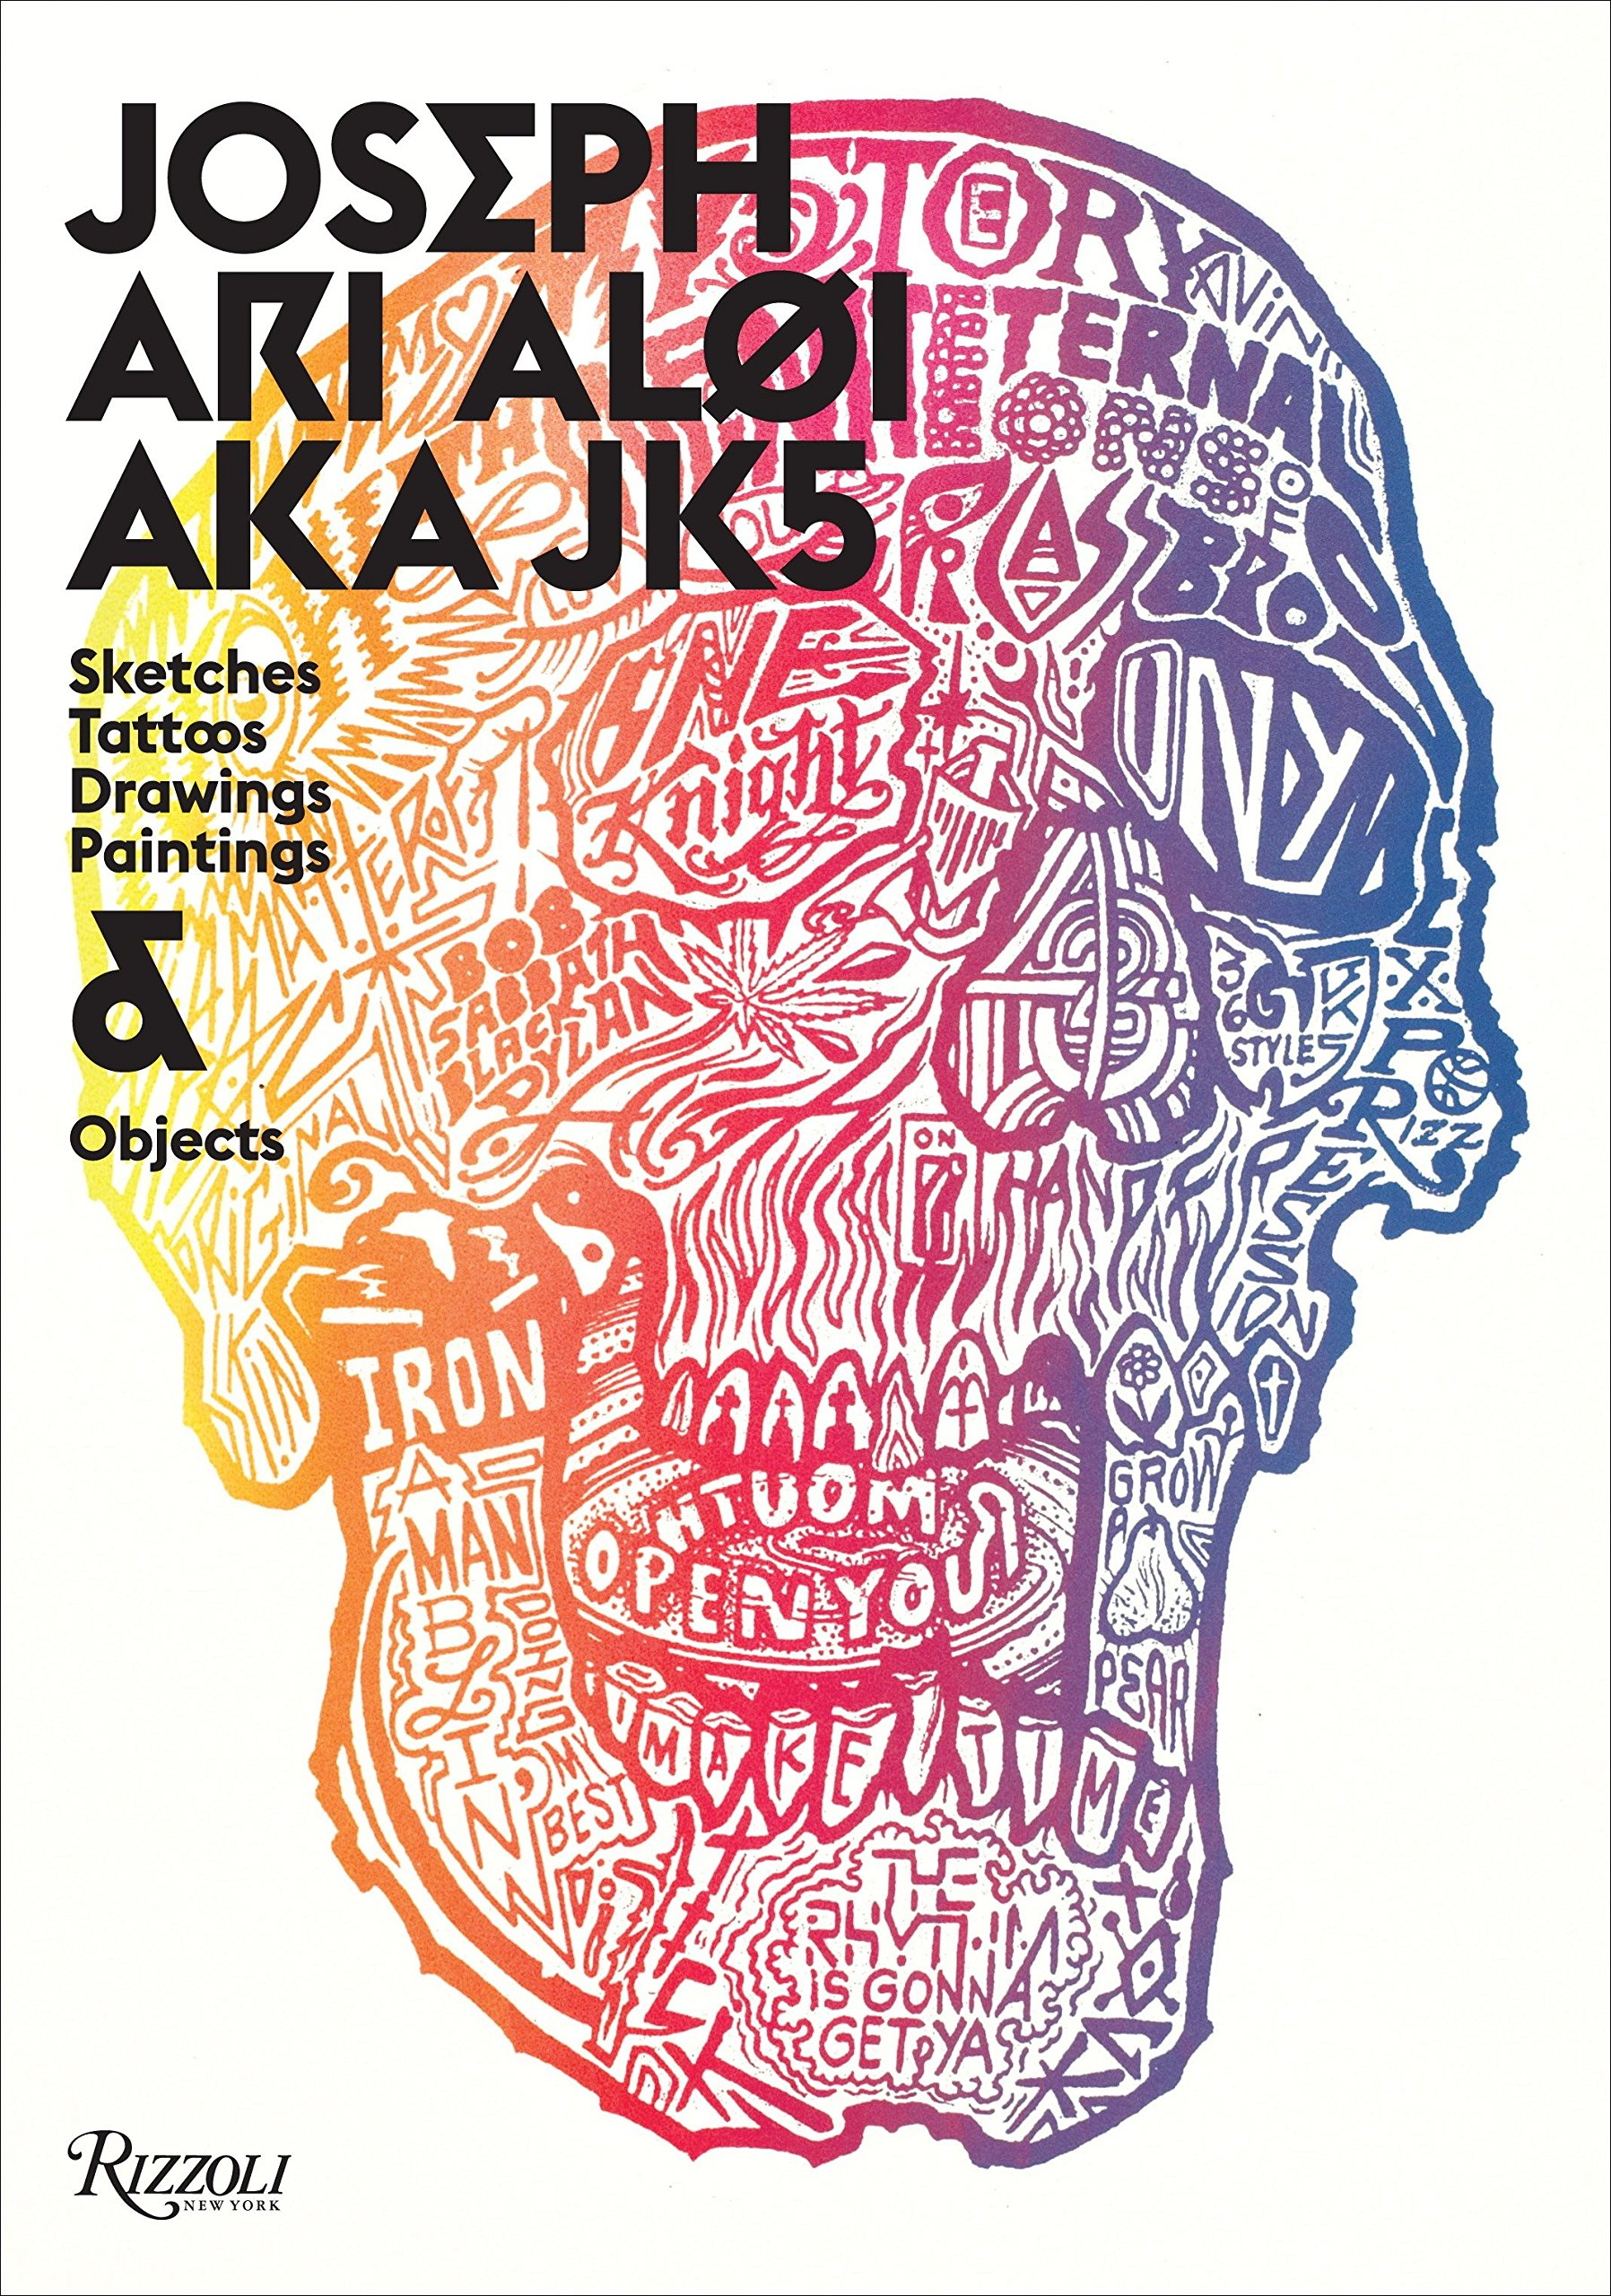 Joseph Ari Aloi Aka Jk5 An Archive Of Sketches Tattoos